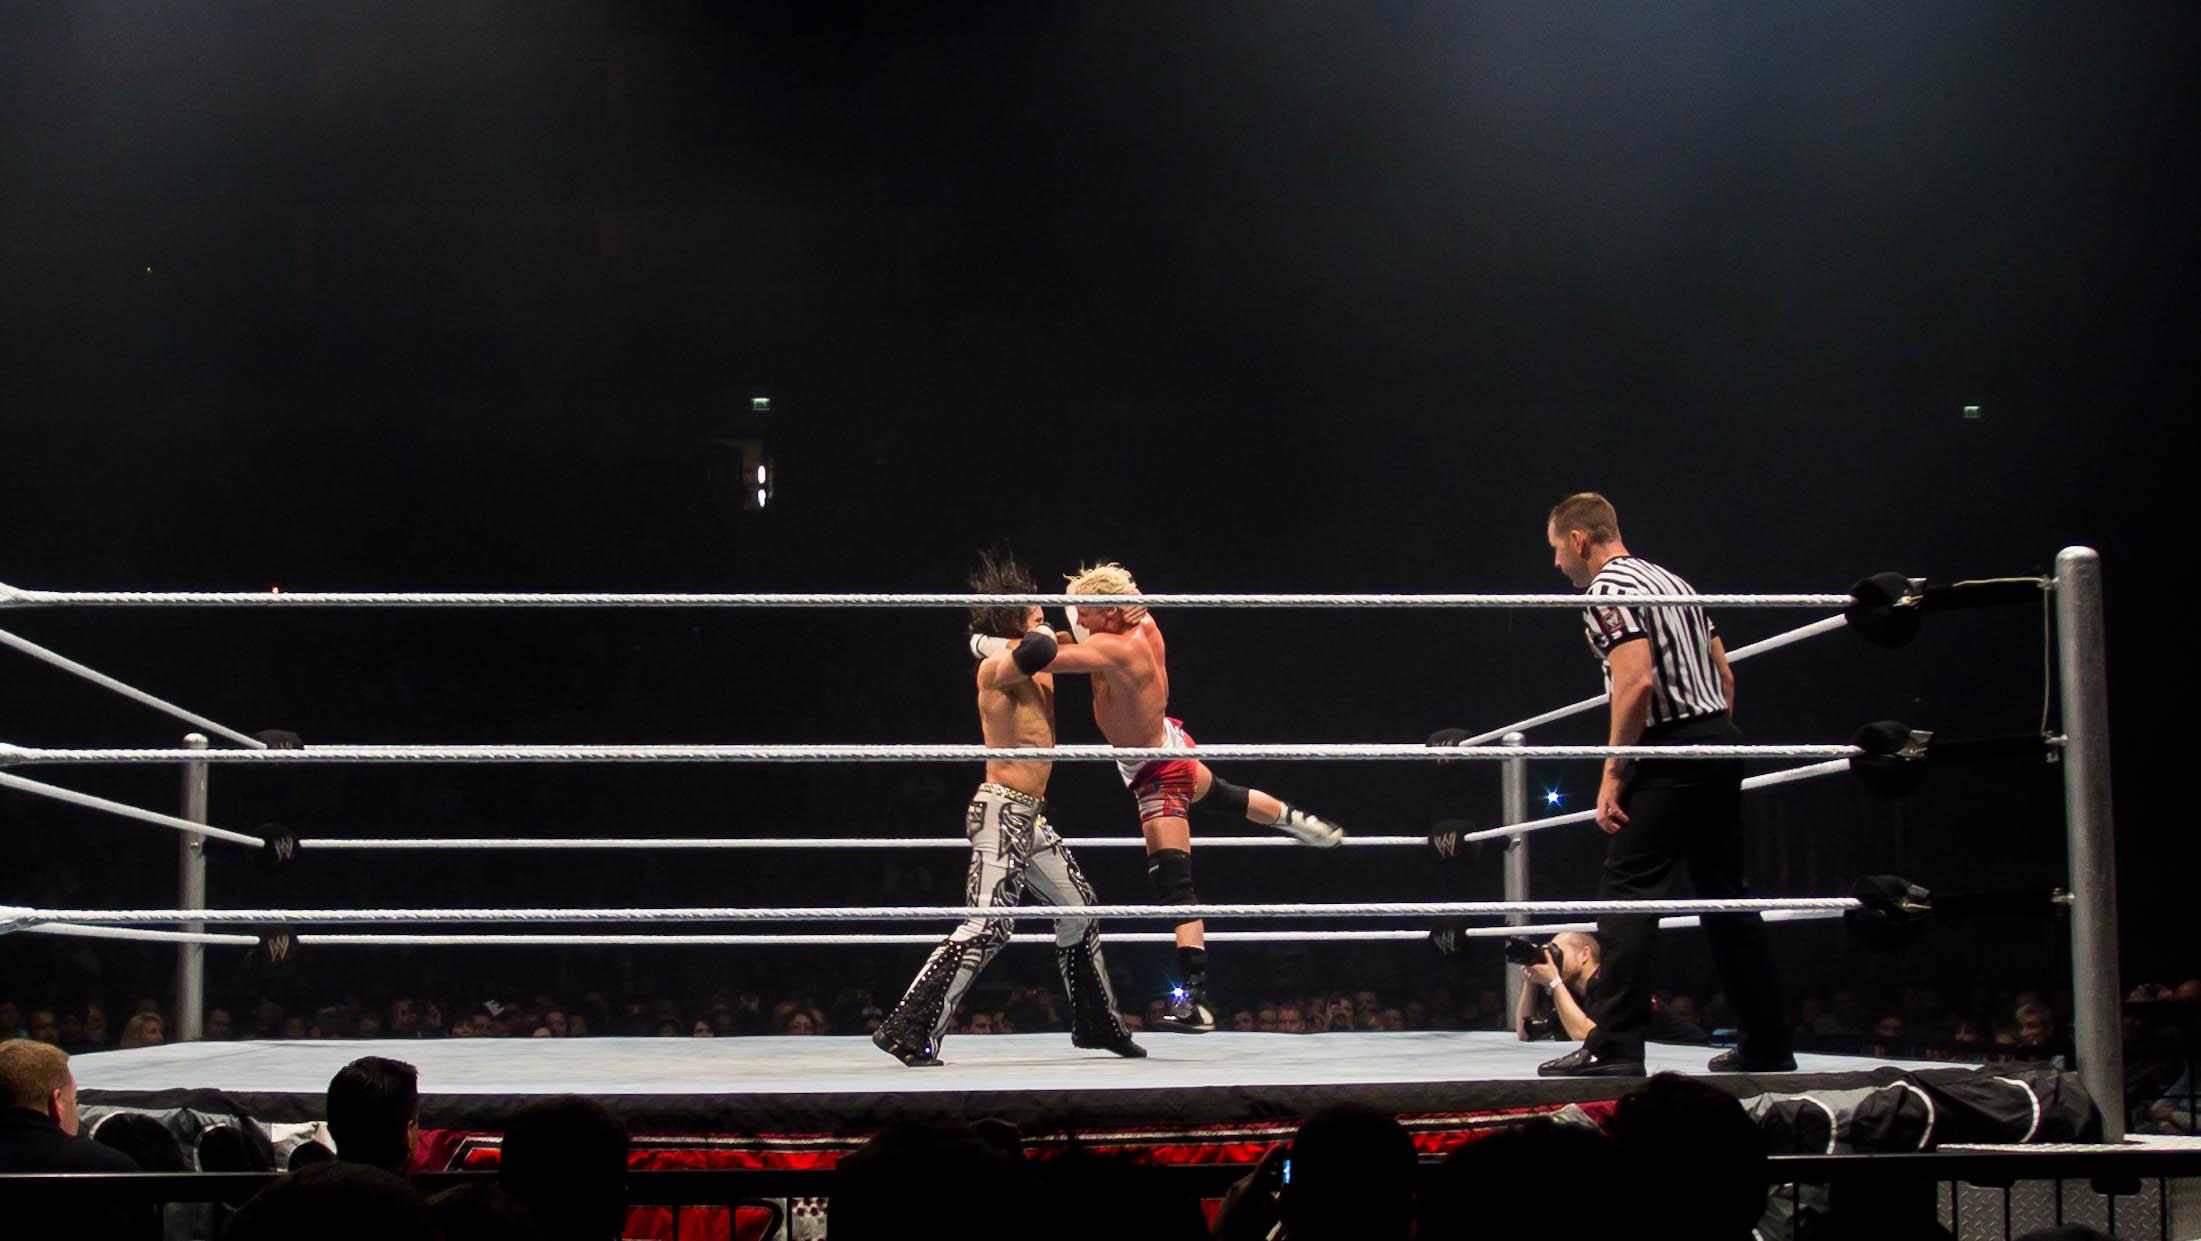 ¿Regresará John Morrison a WWE? Dolph Ziggler opina